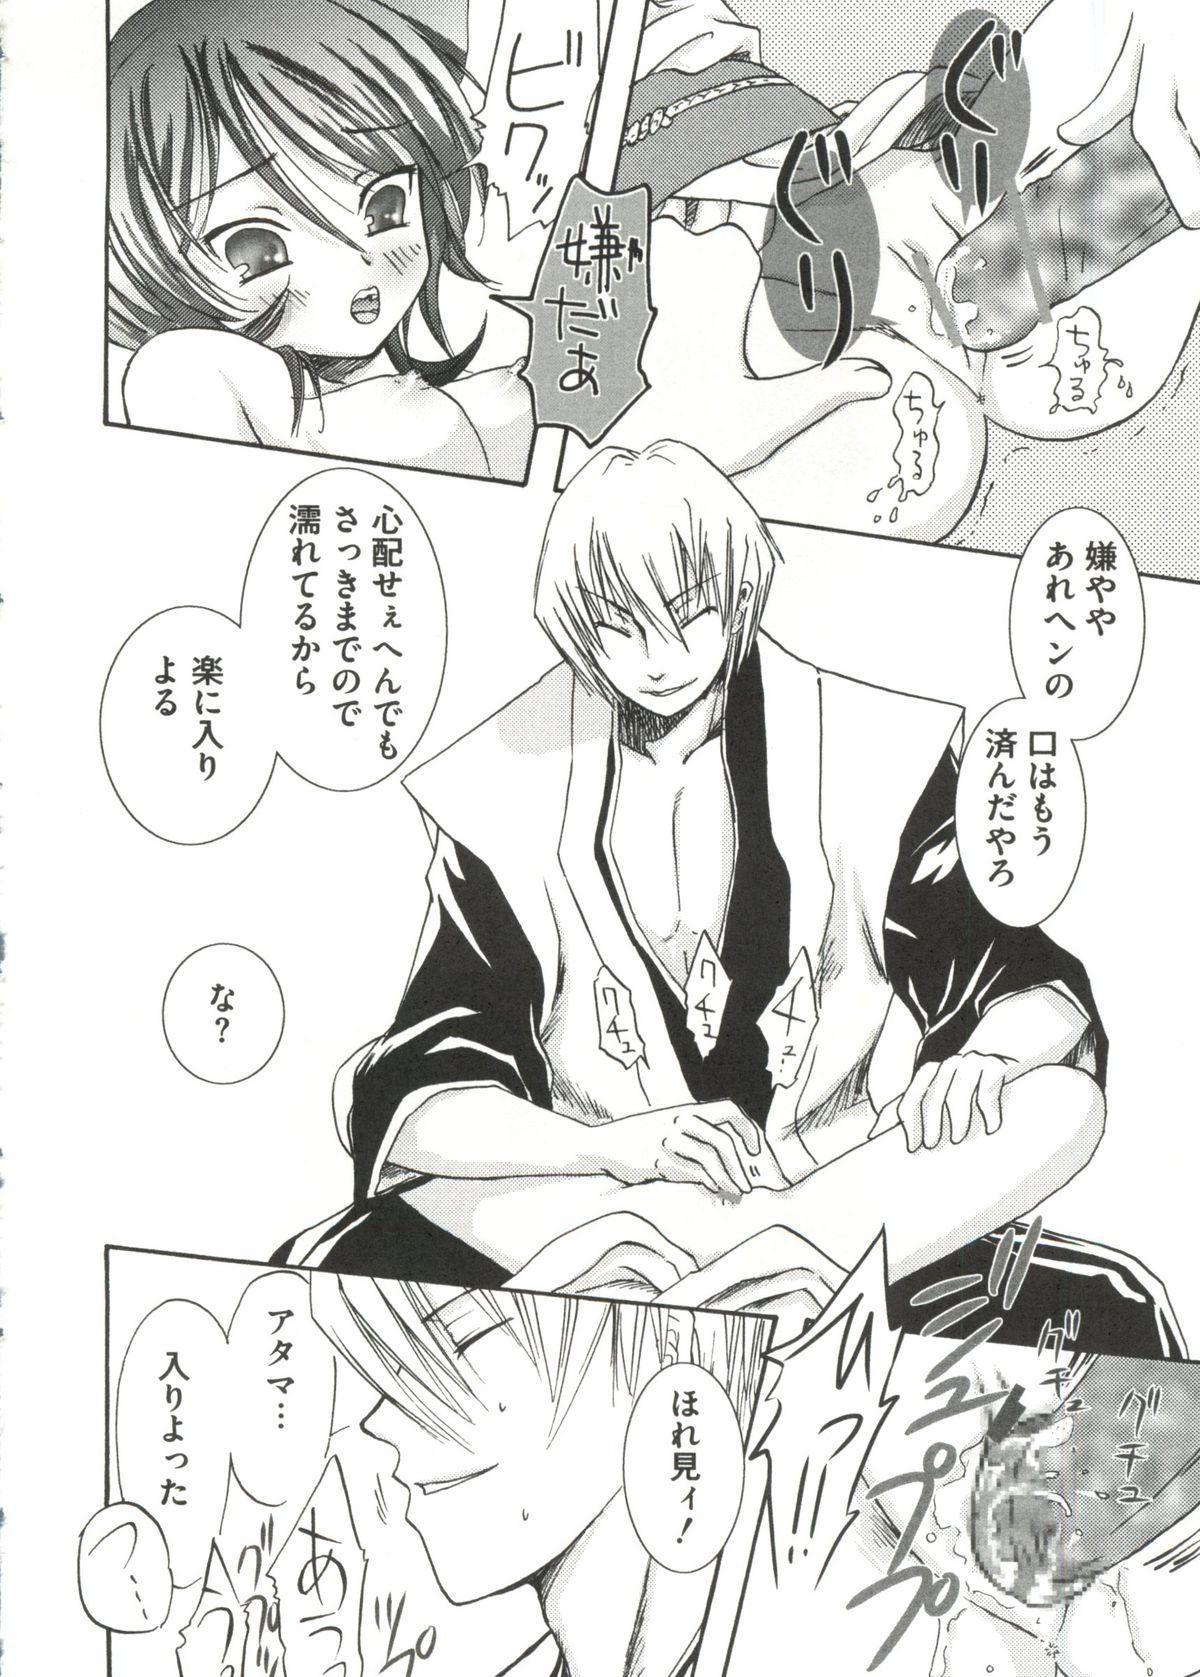 Geki Jump Super 21